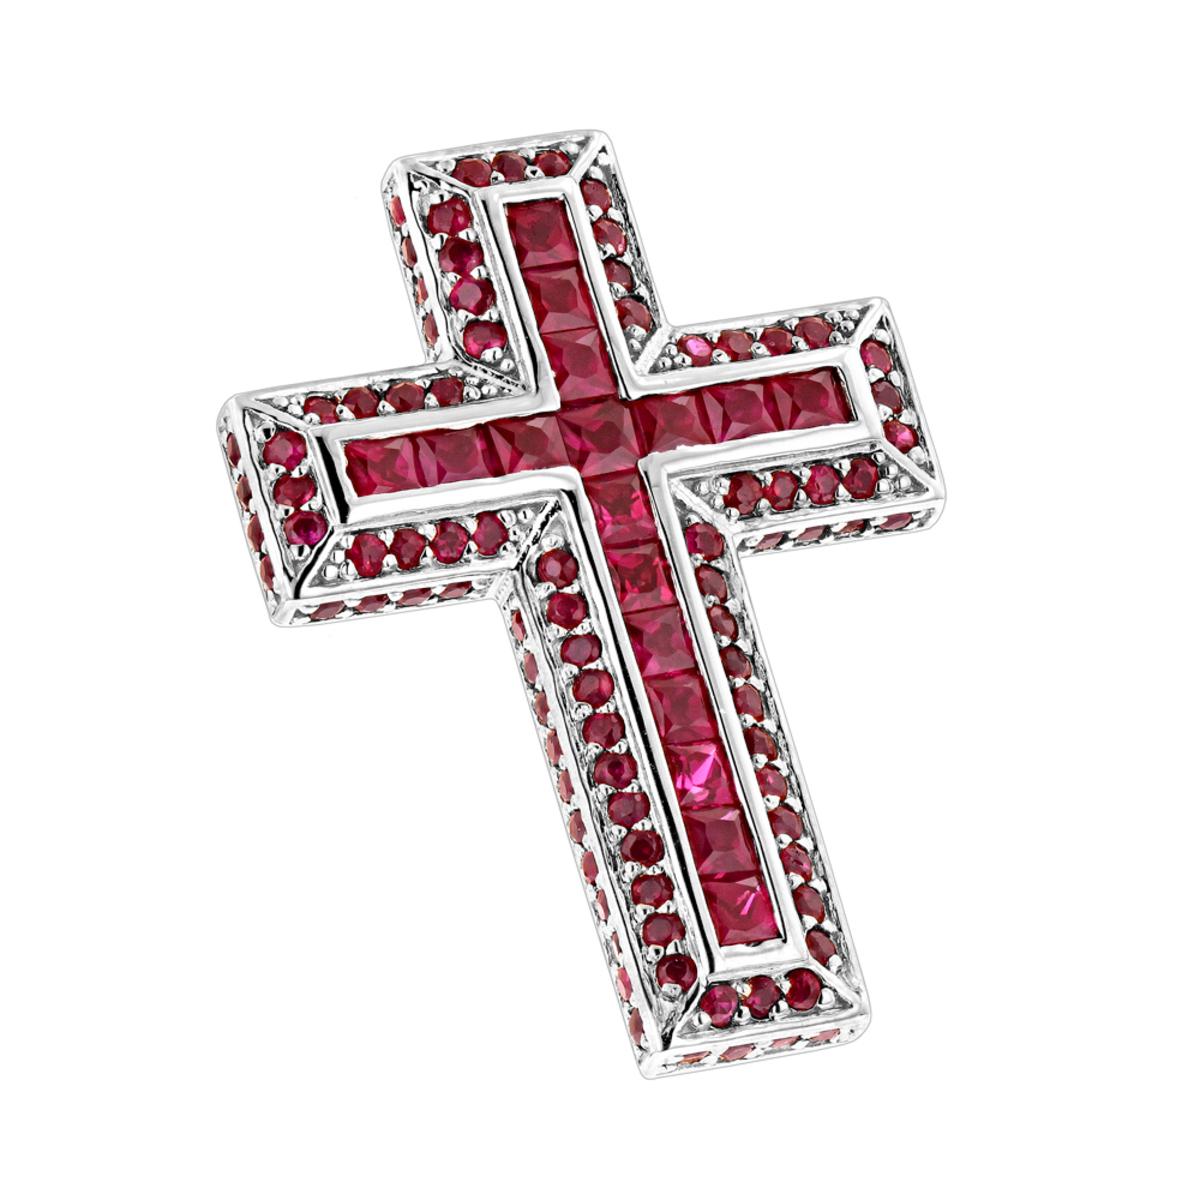 14K Gold Ruby Cross Pendant Round Princess Cut 2.85ct by Luxurman